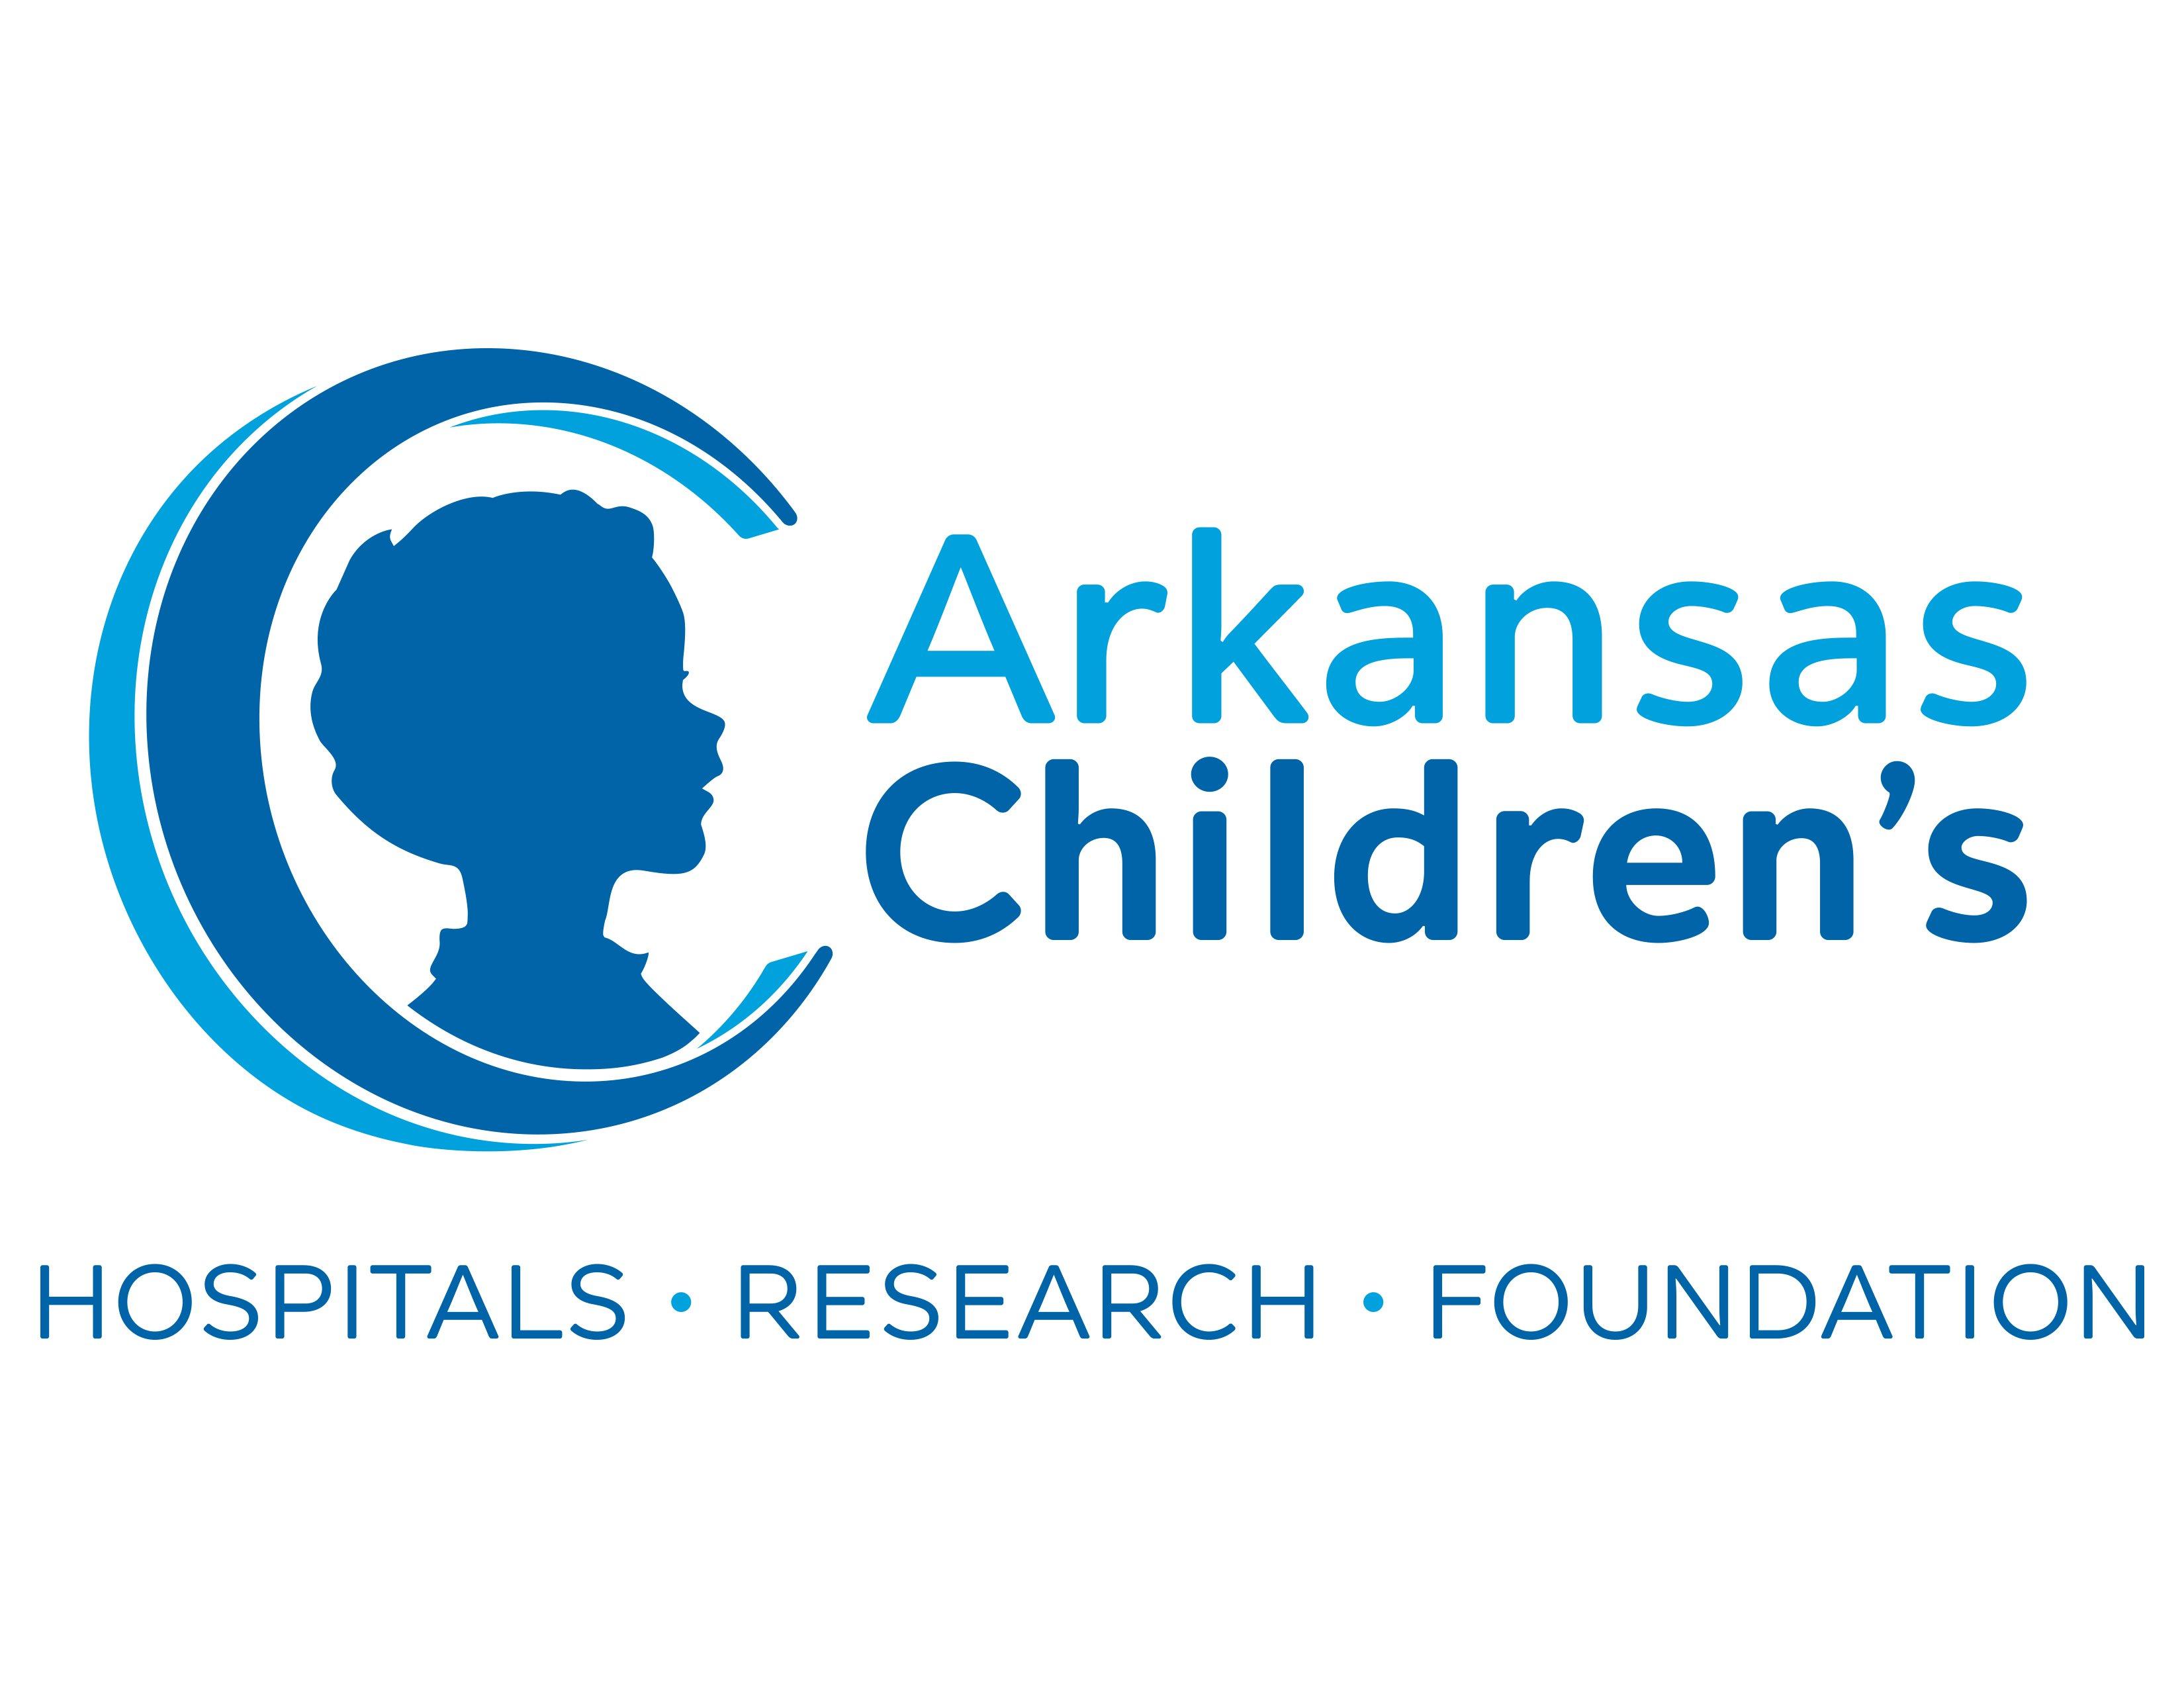 AC-Hospitals_Research-Foundation_V_4C